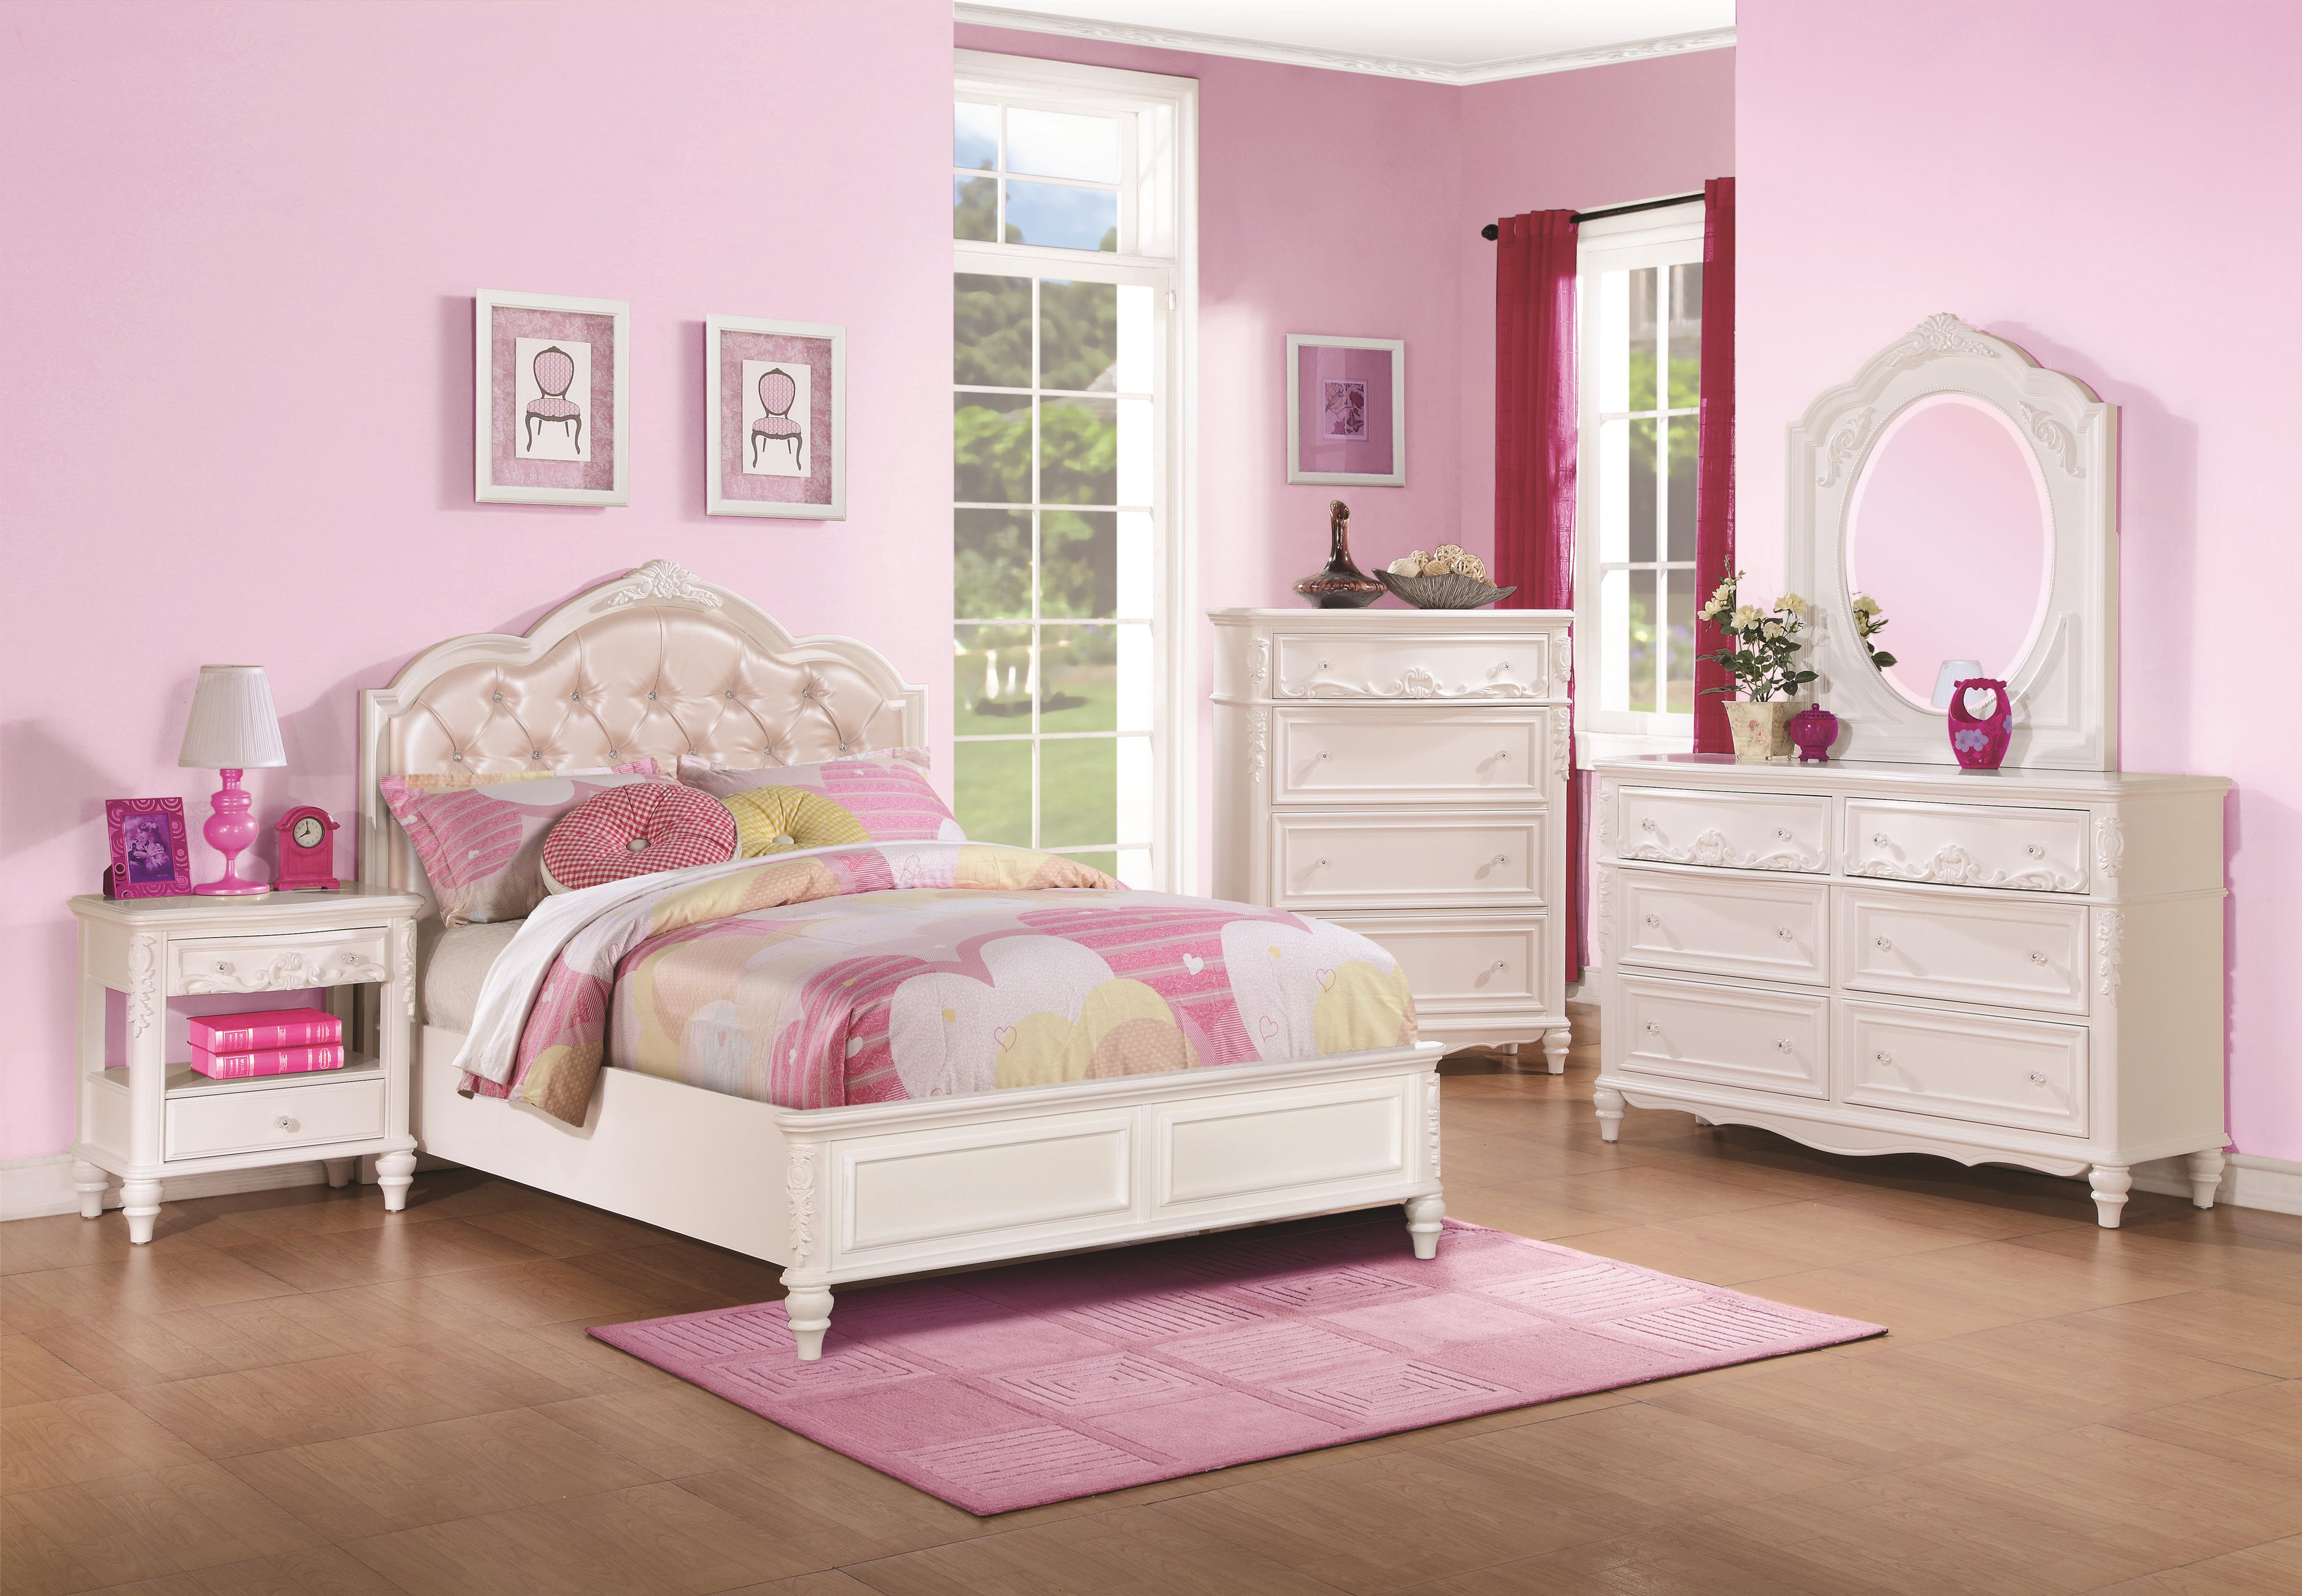 a1 furniture mattress